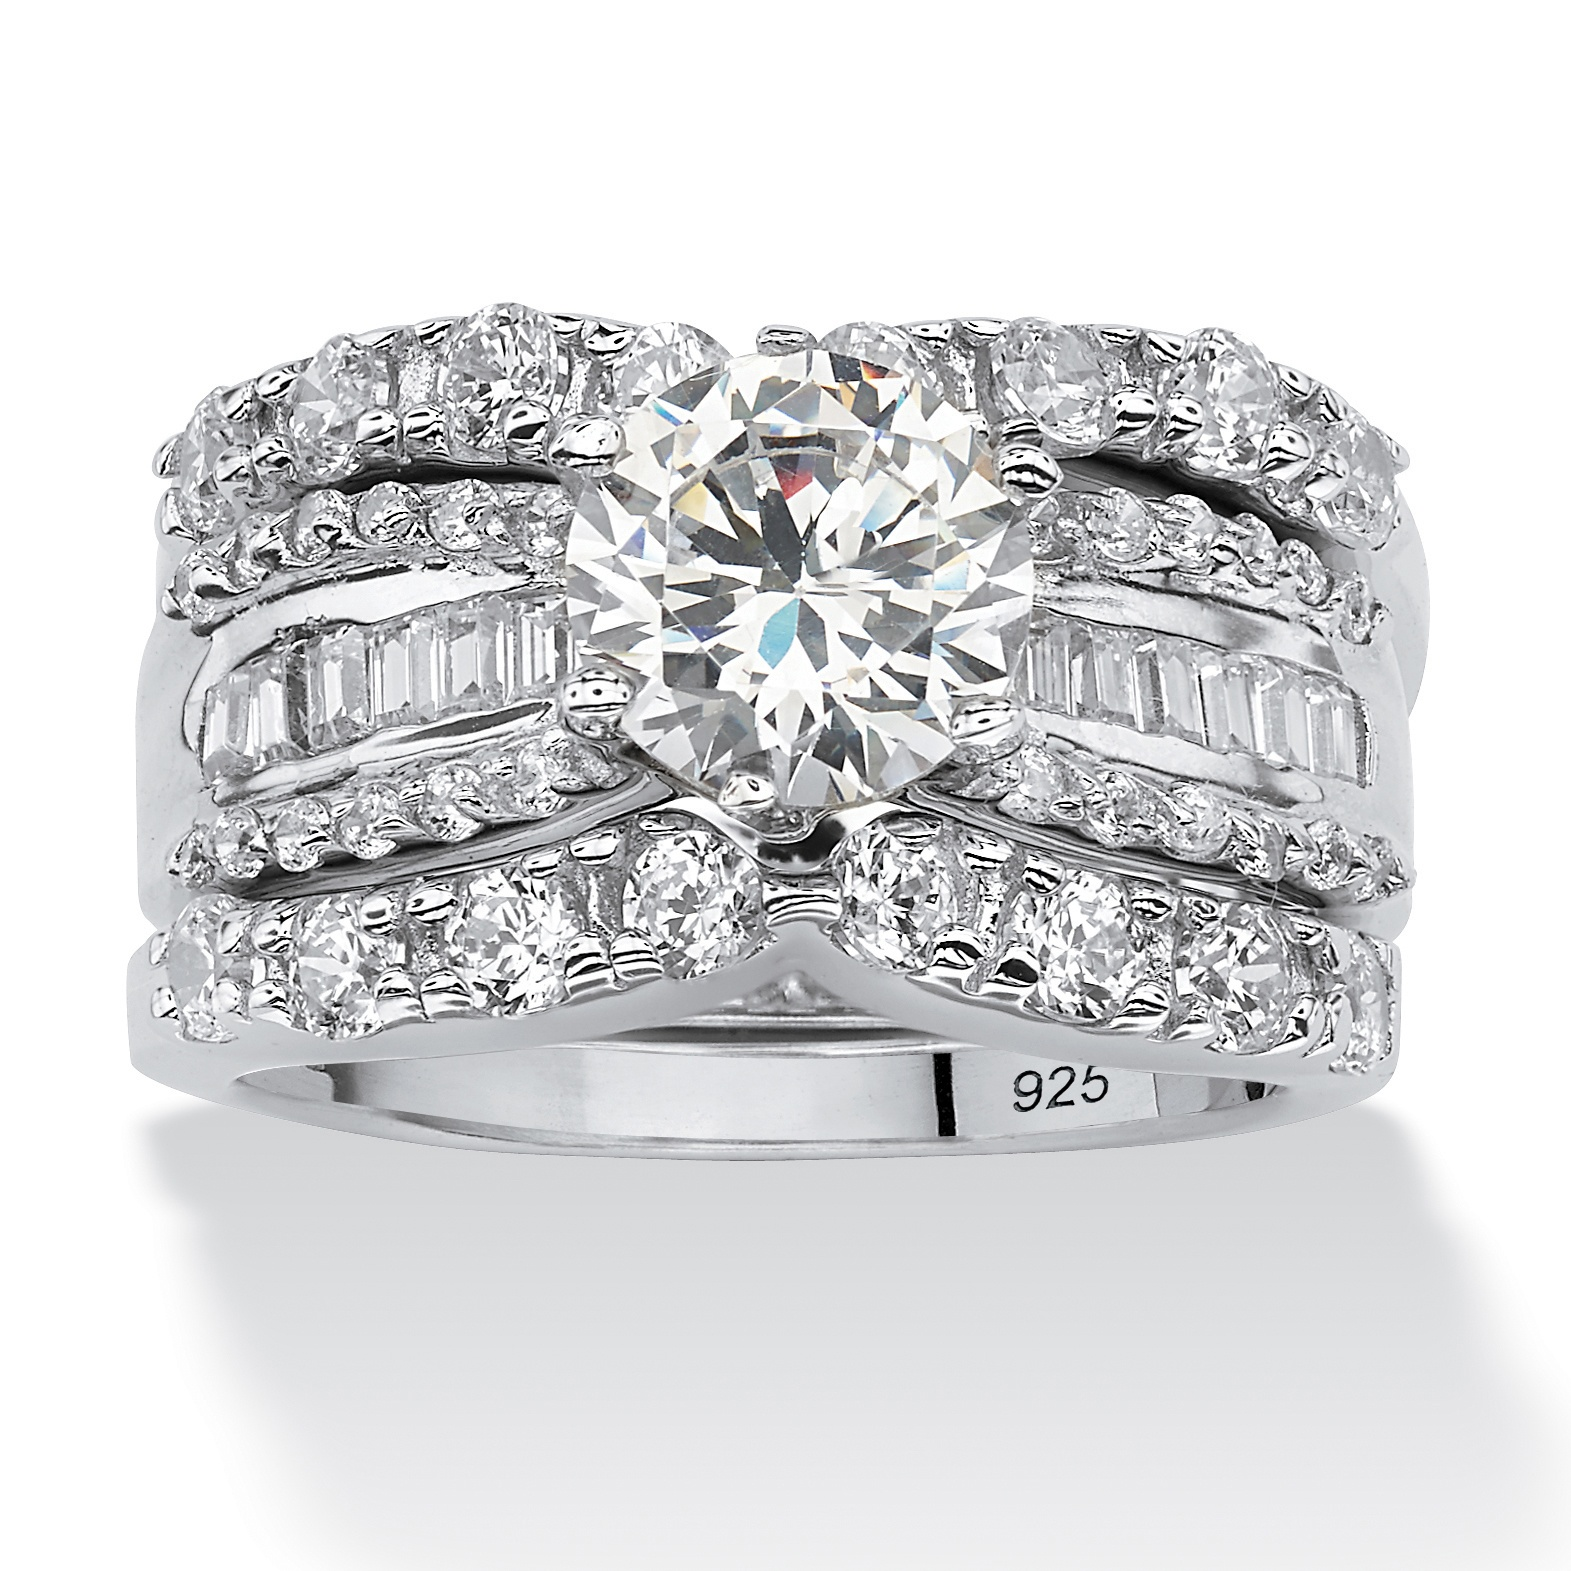 Wedding Ring Sets Palm Beach Jewelry